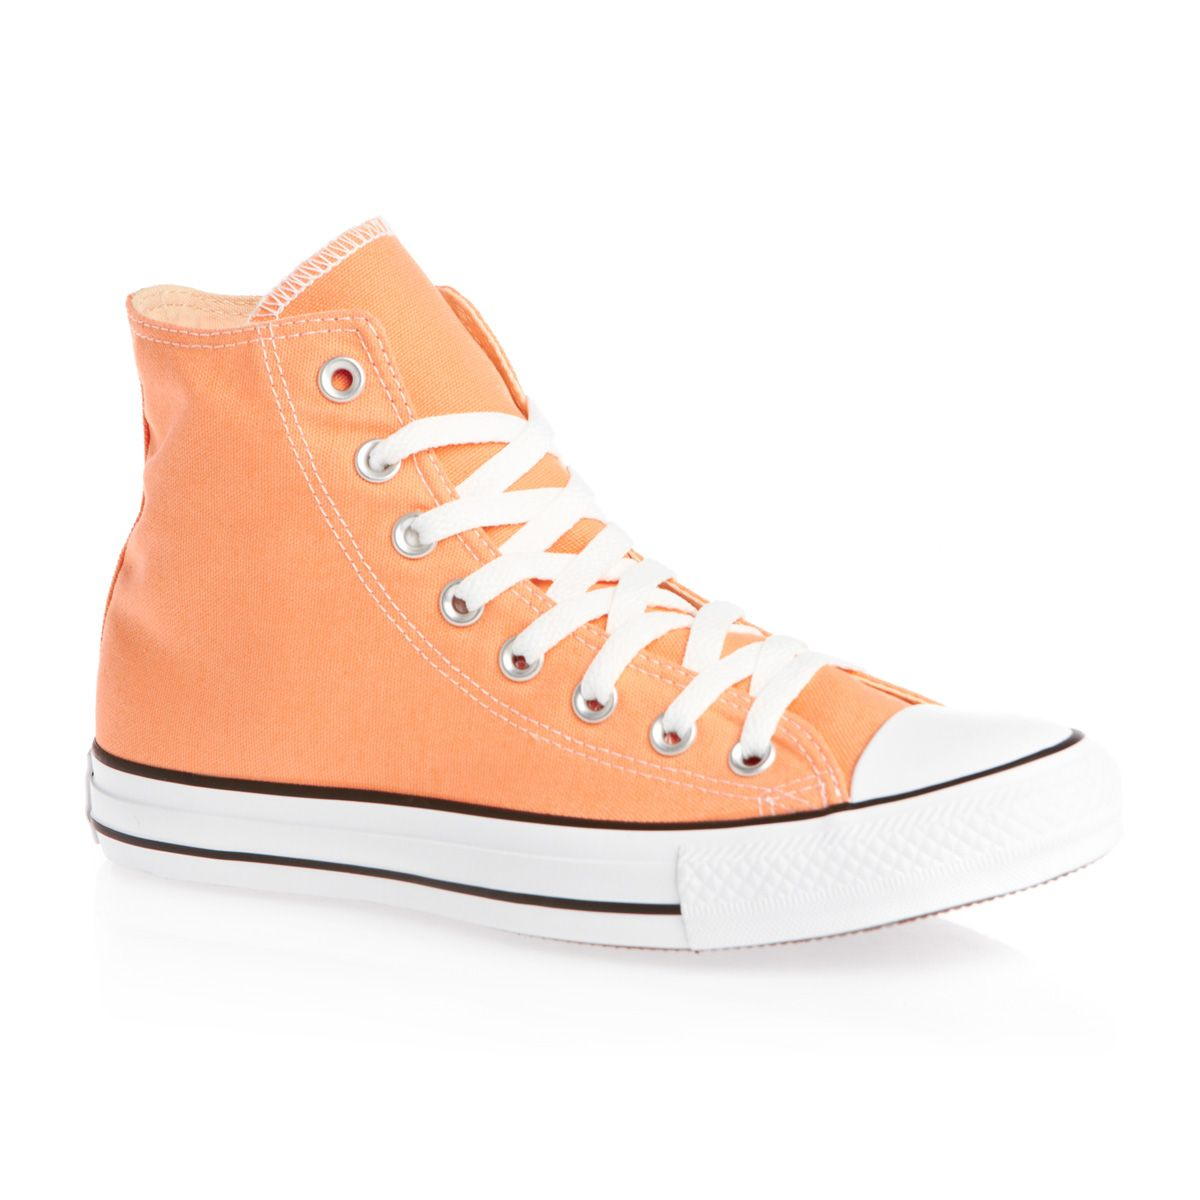 ca937f1fe4f8 Converse Chuck Taylor All Star Shoes - Peach Cobbler